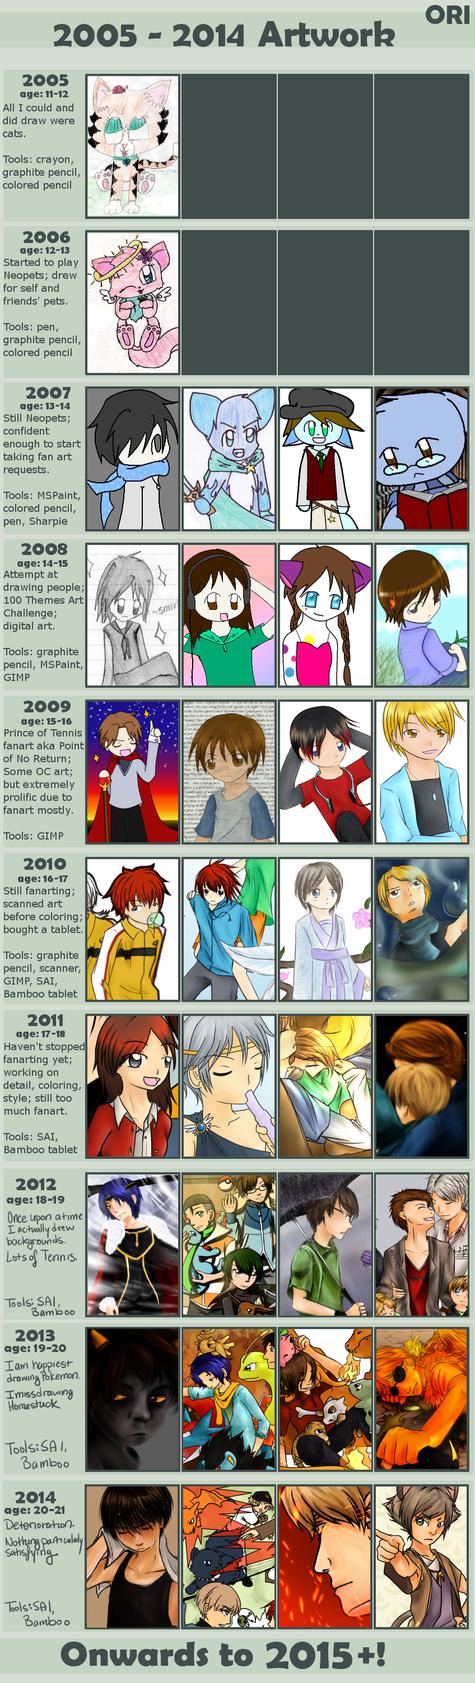 Improvement Meme [2005-2014] by Perimones